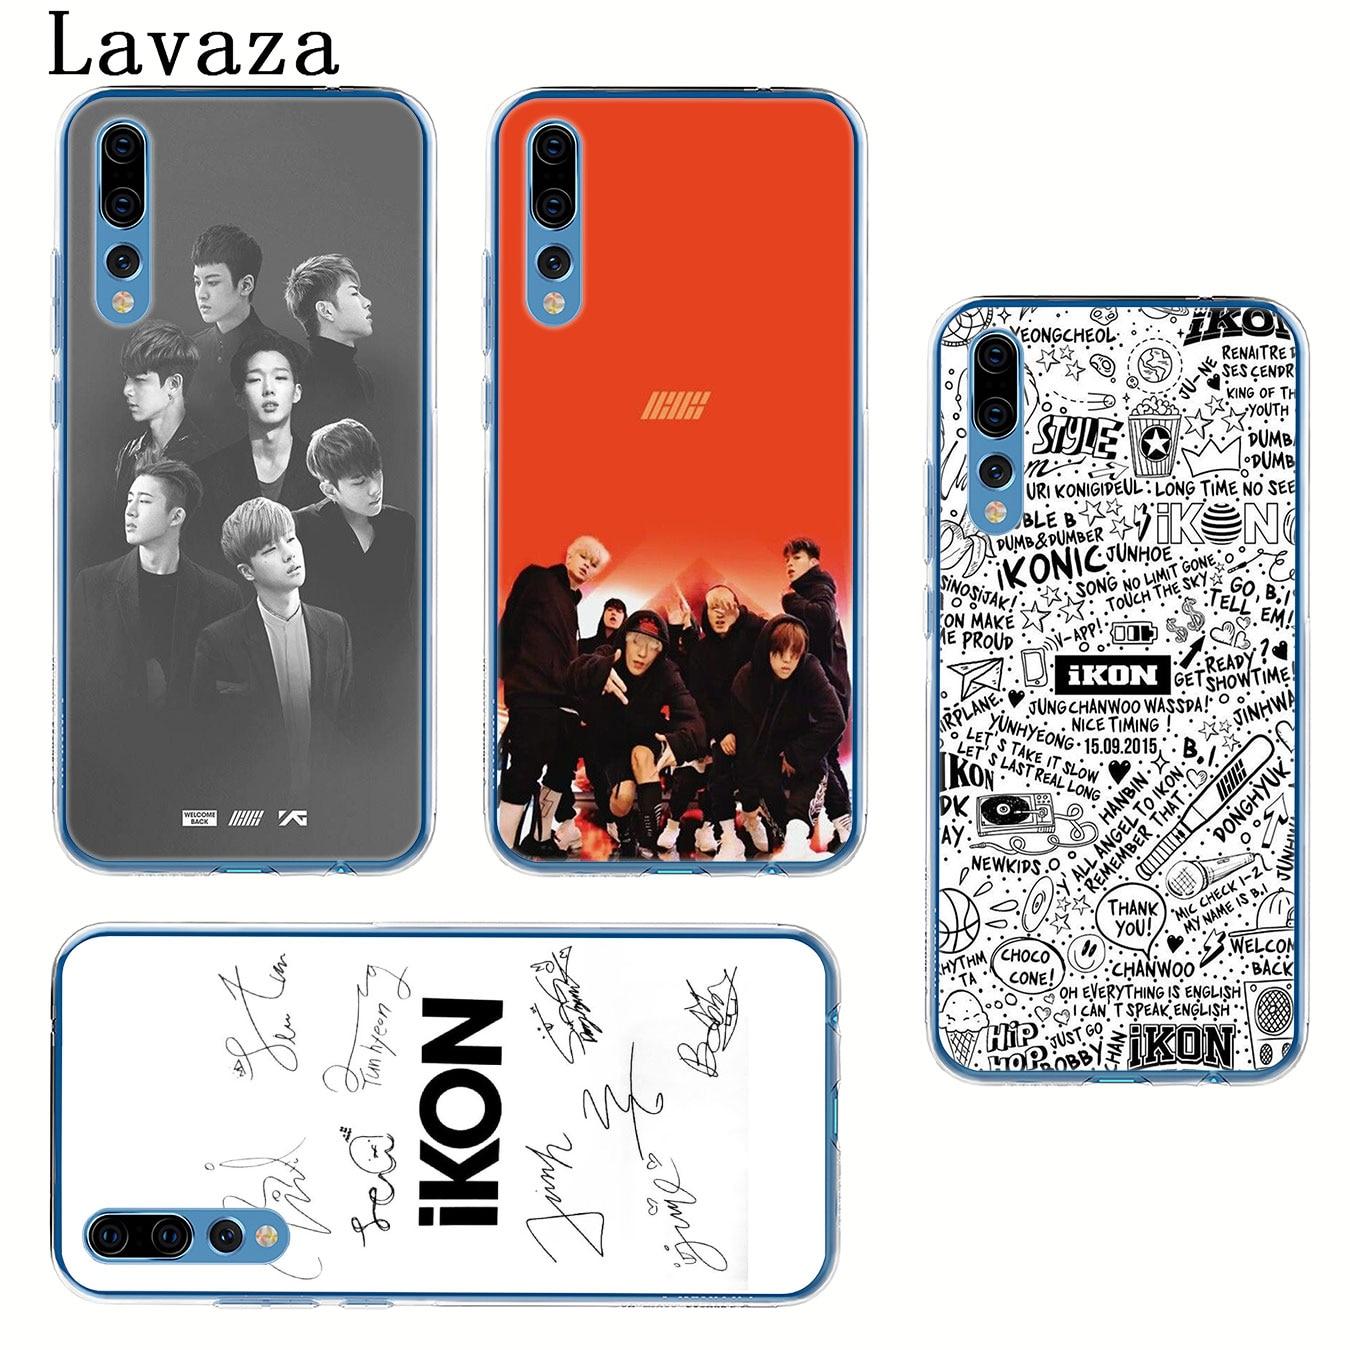 US $1 51 24% OFF|Lavaza music ikon kpop Hard Phone Case for Huawei Mate 20  P20 Pro 10 Lite for Huawei Nova 5i 4 3i 3 2i Lite Cover-in Half-wrapped